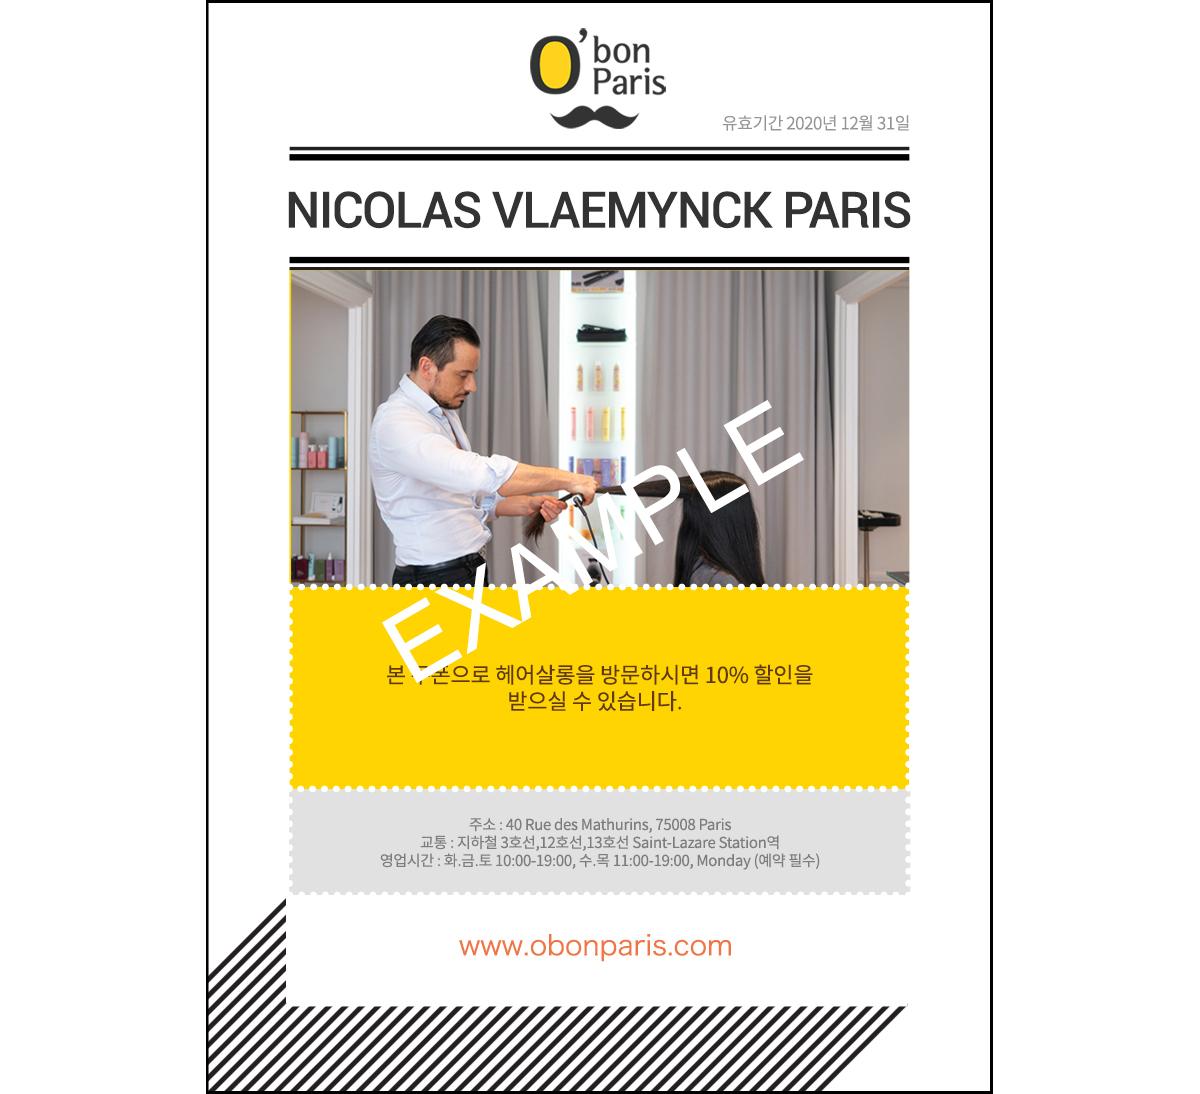 NICOLAS VLAEMYNCK PARIS HAIR SALON DISCOUNT COUPON